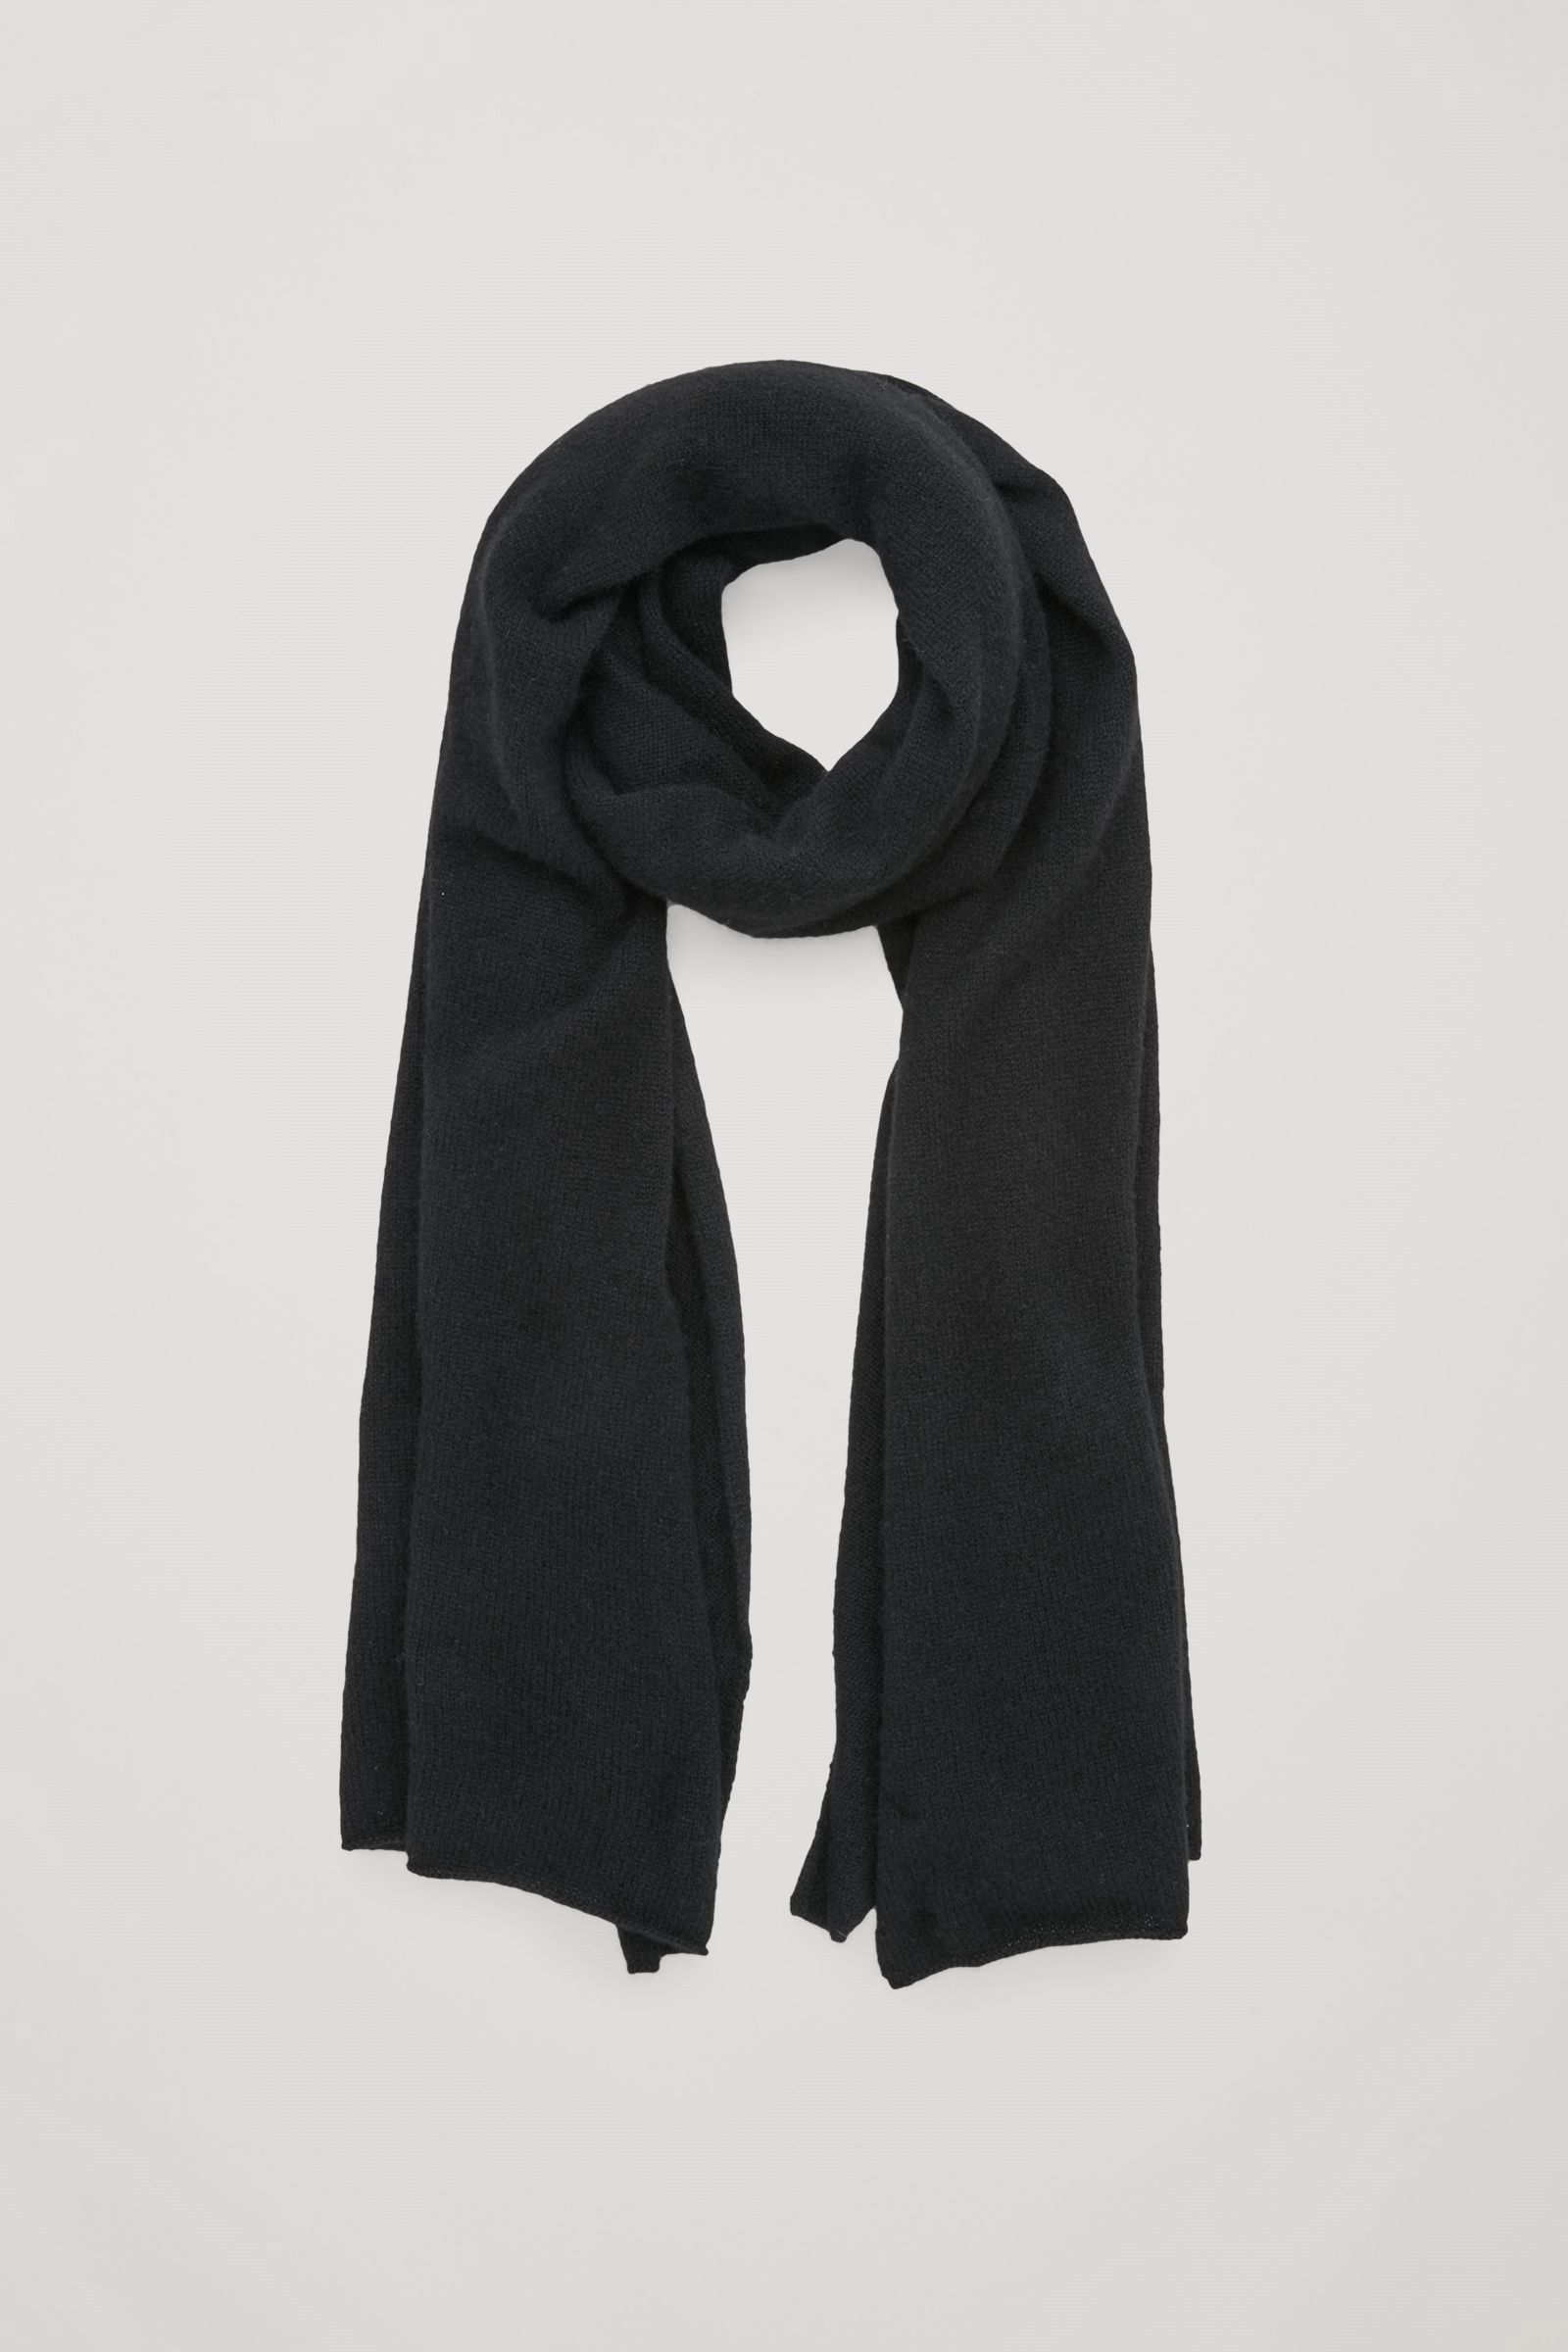 4a9ac17d902c9 COS Cashmere scarf - Black. #cos # | Cos | Cashmere scarf, Cashmere ...